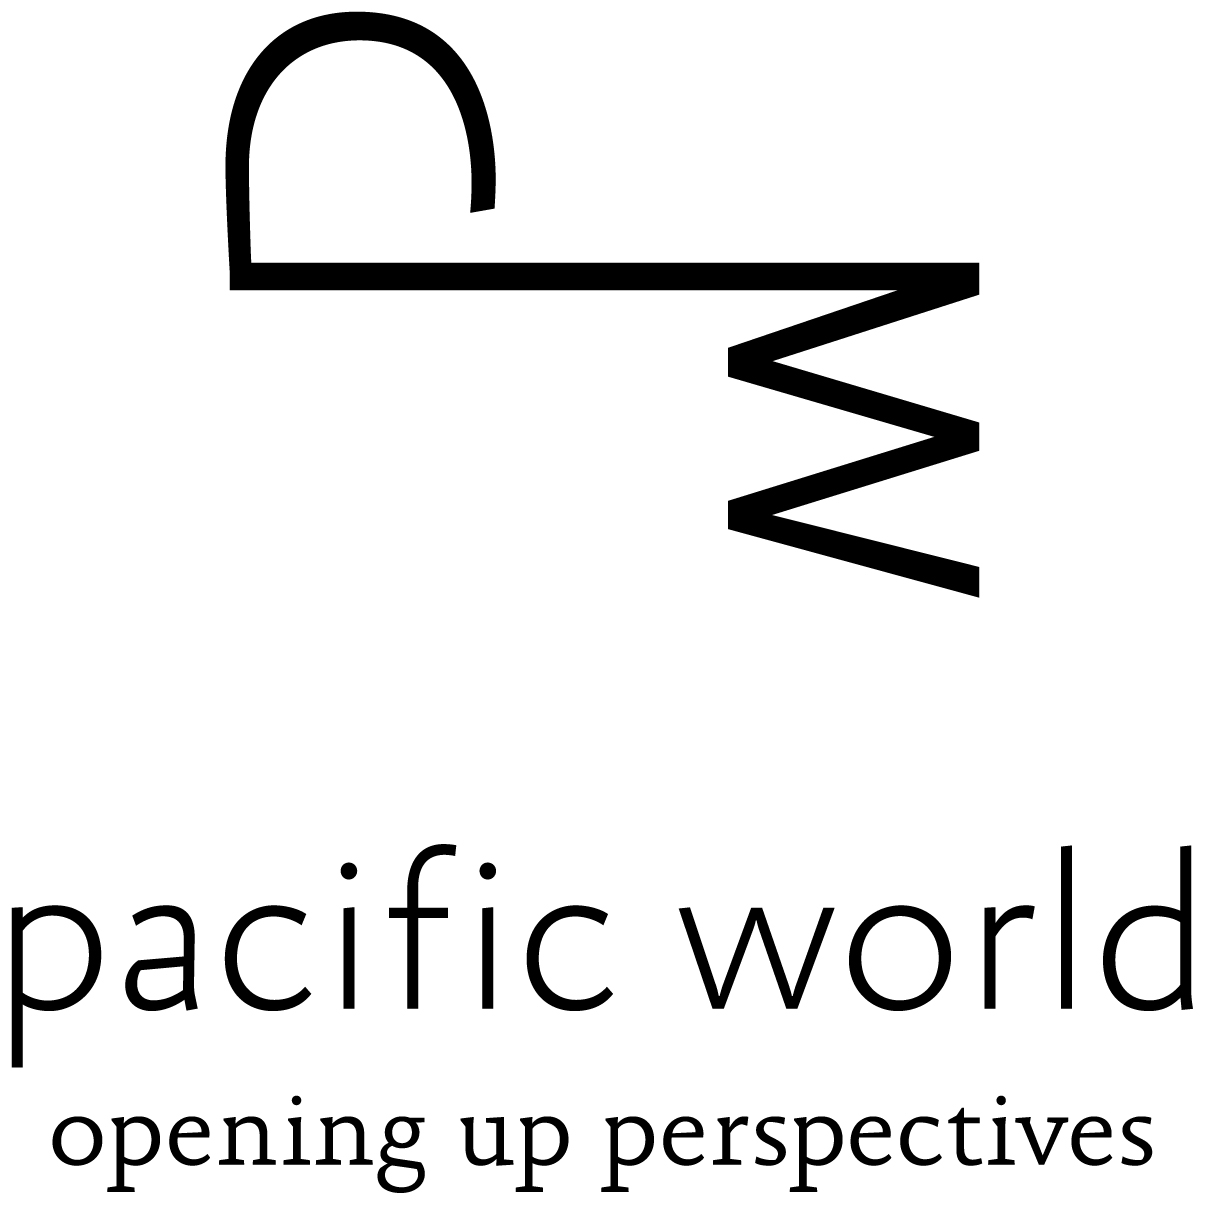 Pacific World-STD_claim1_3CP